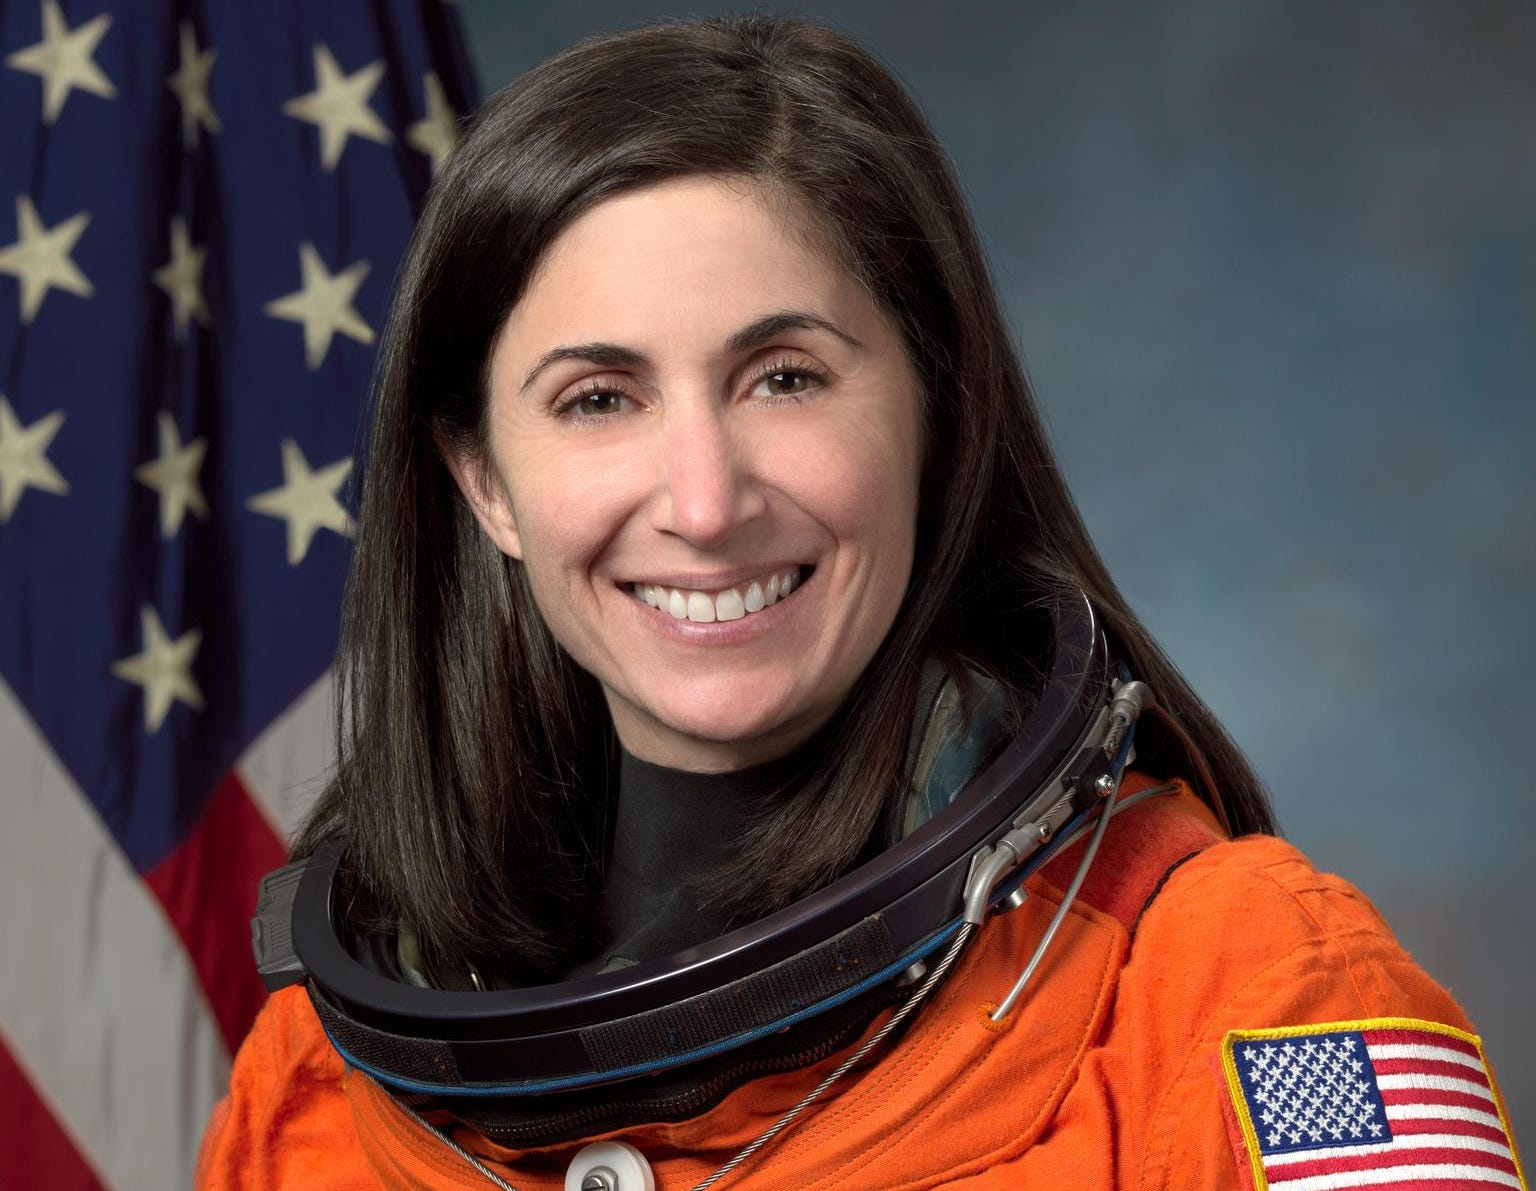 NASA Astronaut Nicole Stott's official agency portrait.